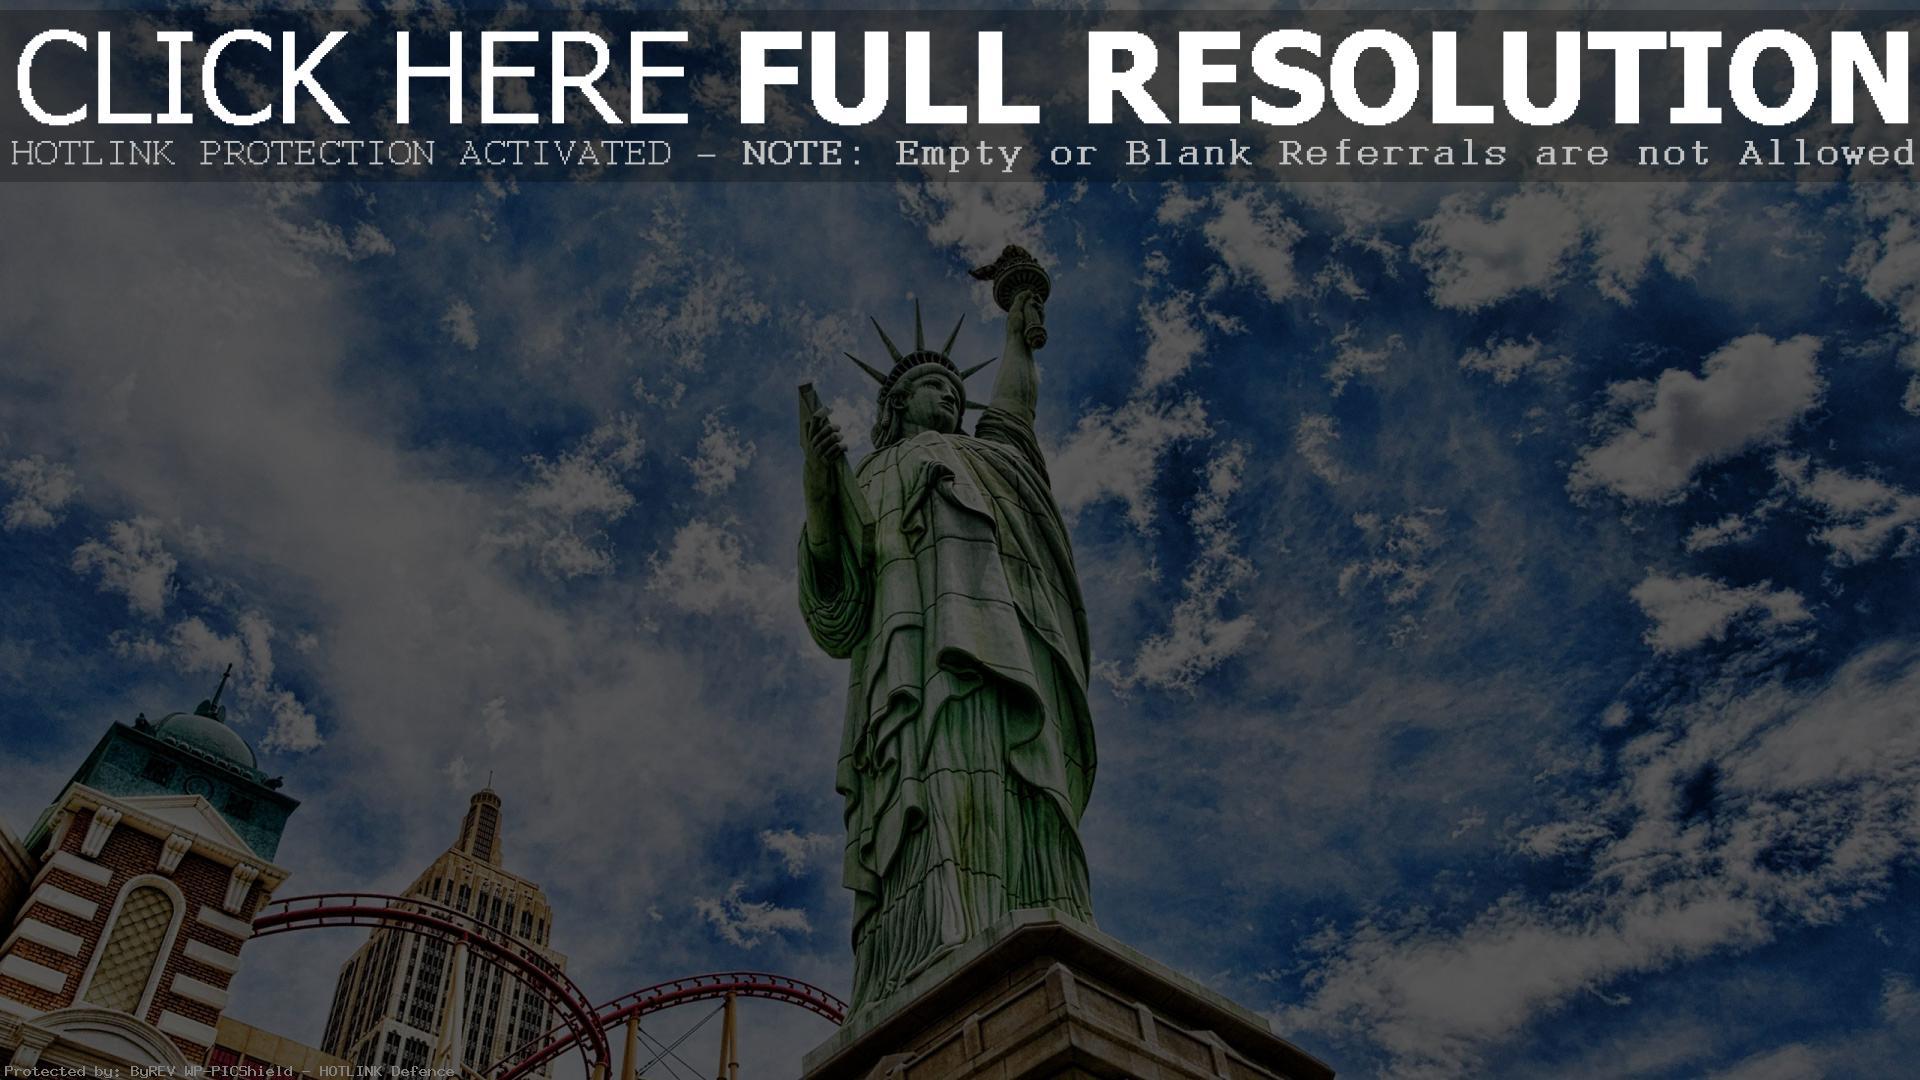 Обои full hd Статуя Свободы под облаками 1920х1080